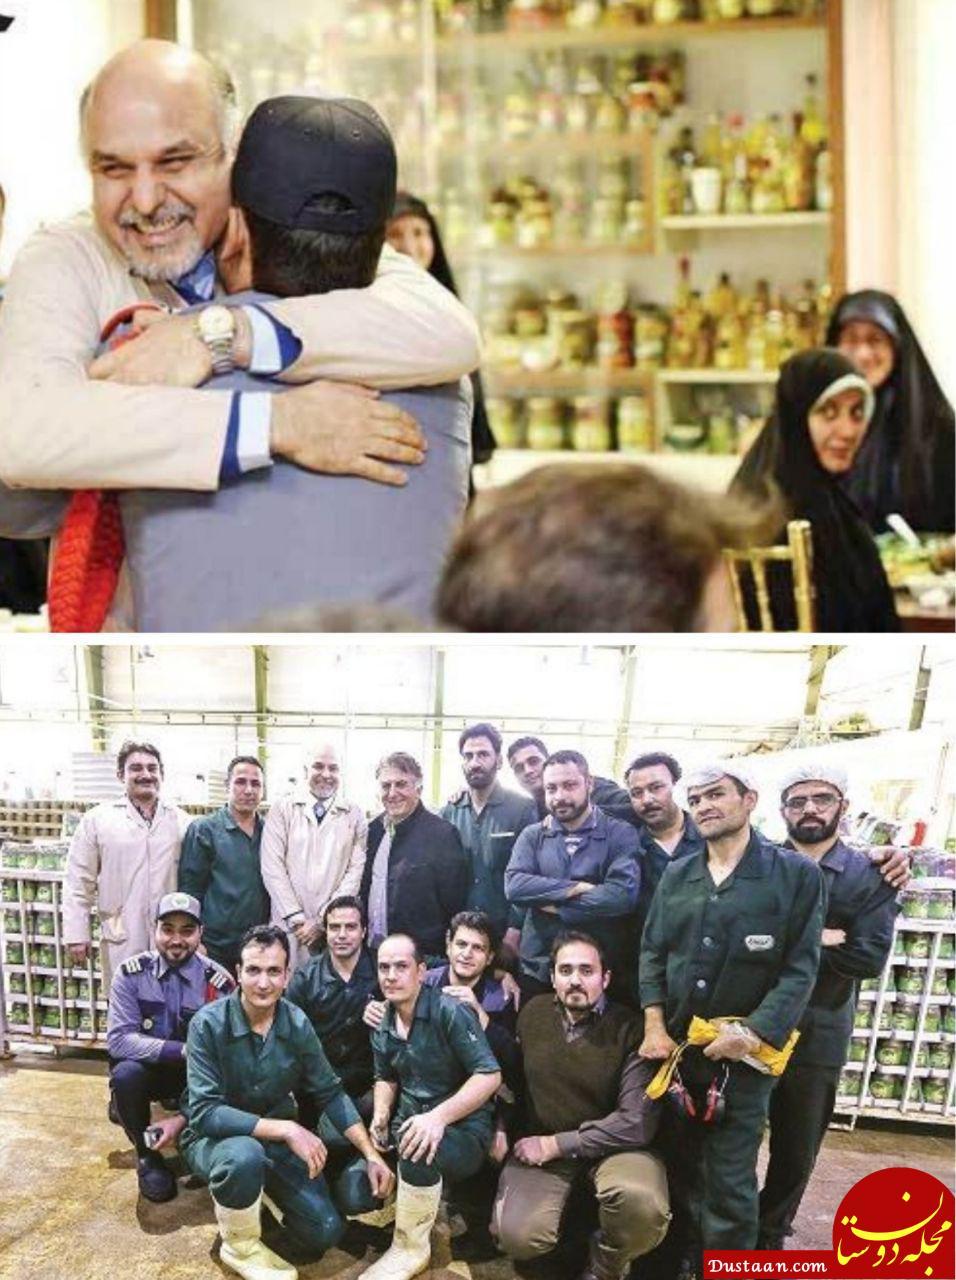 www.dustaan.com روایت کارخانه داری که فقط افرادی را استخدام می کند که سوءسابقه داشته باشند!